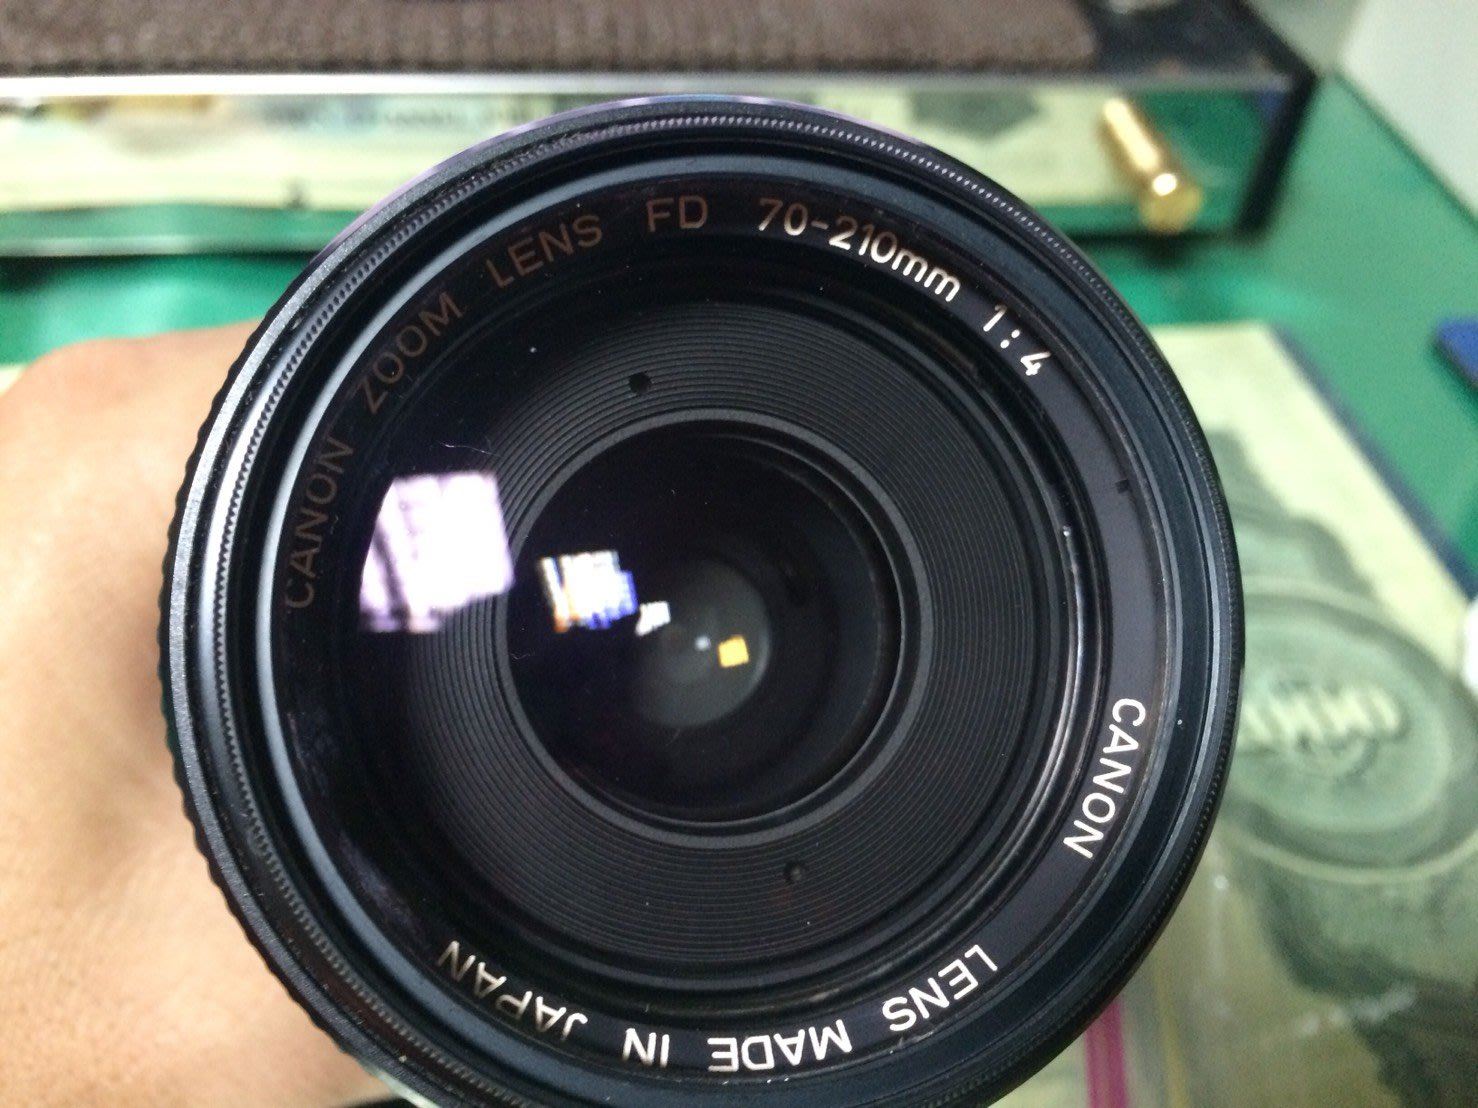 Canon ZOOM LENS FD 70-210mm 1:4 單眼 鏡頭 (Leica、Nikone 35 可參考)